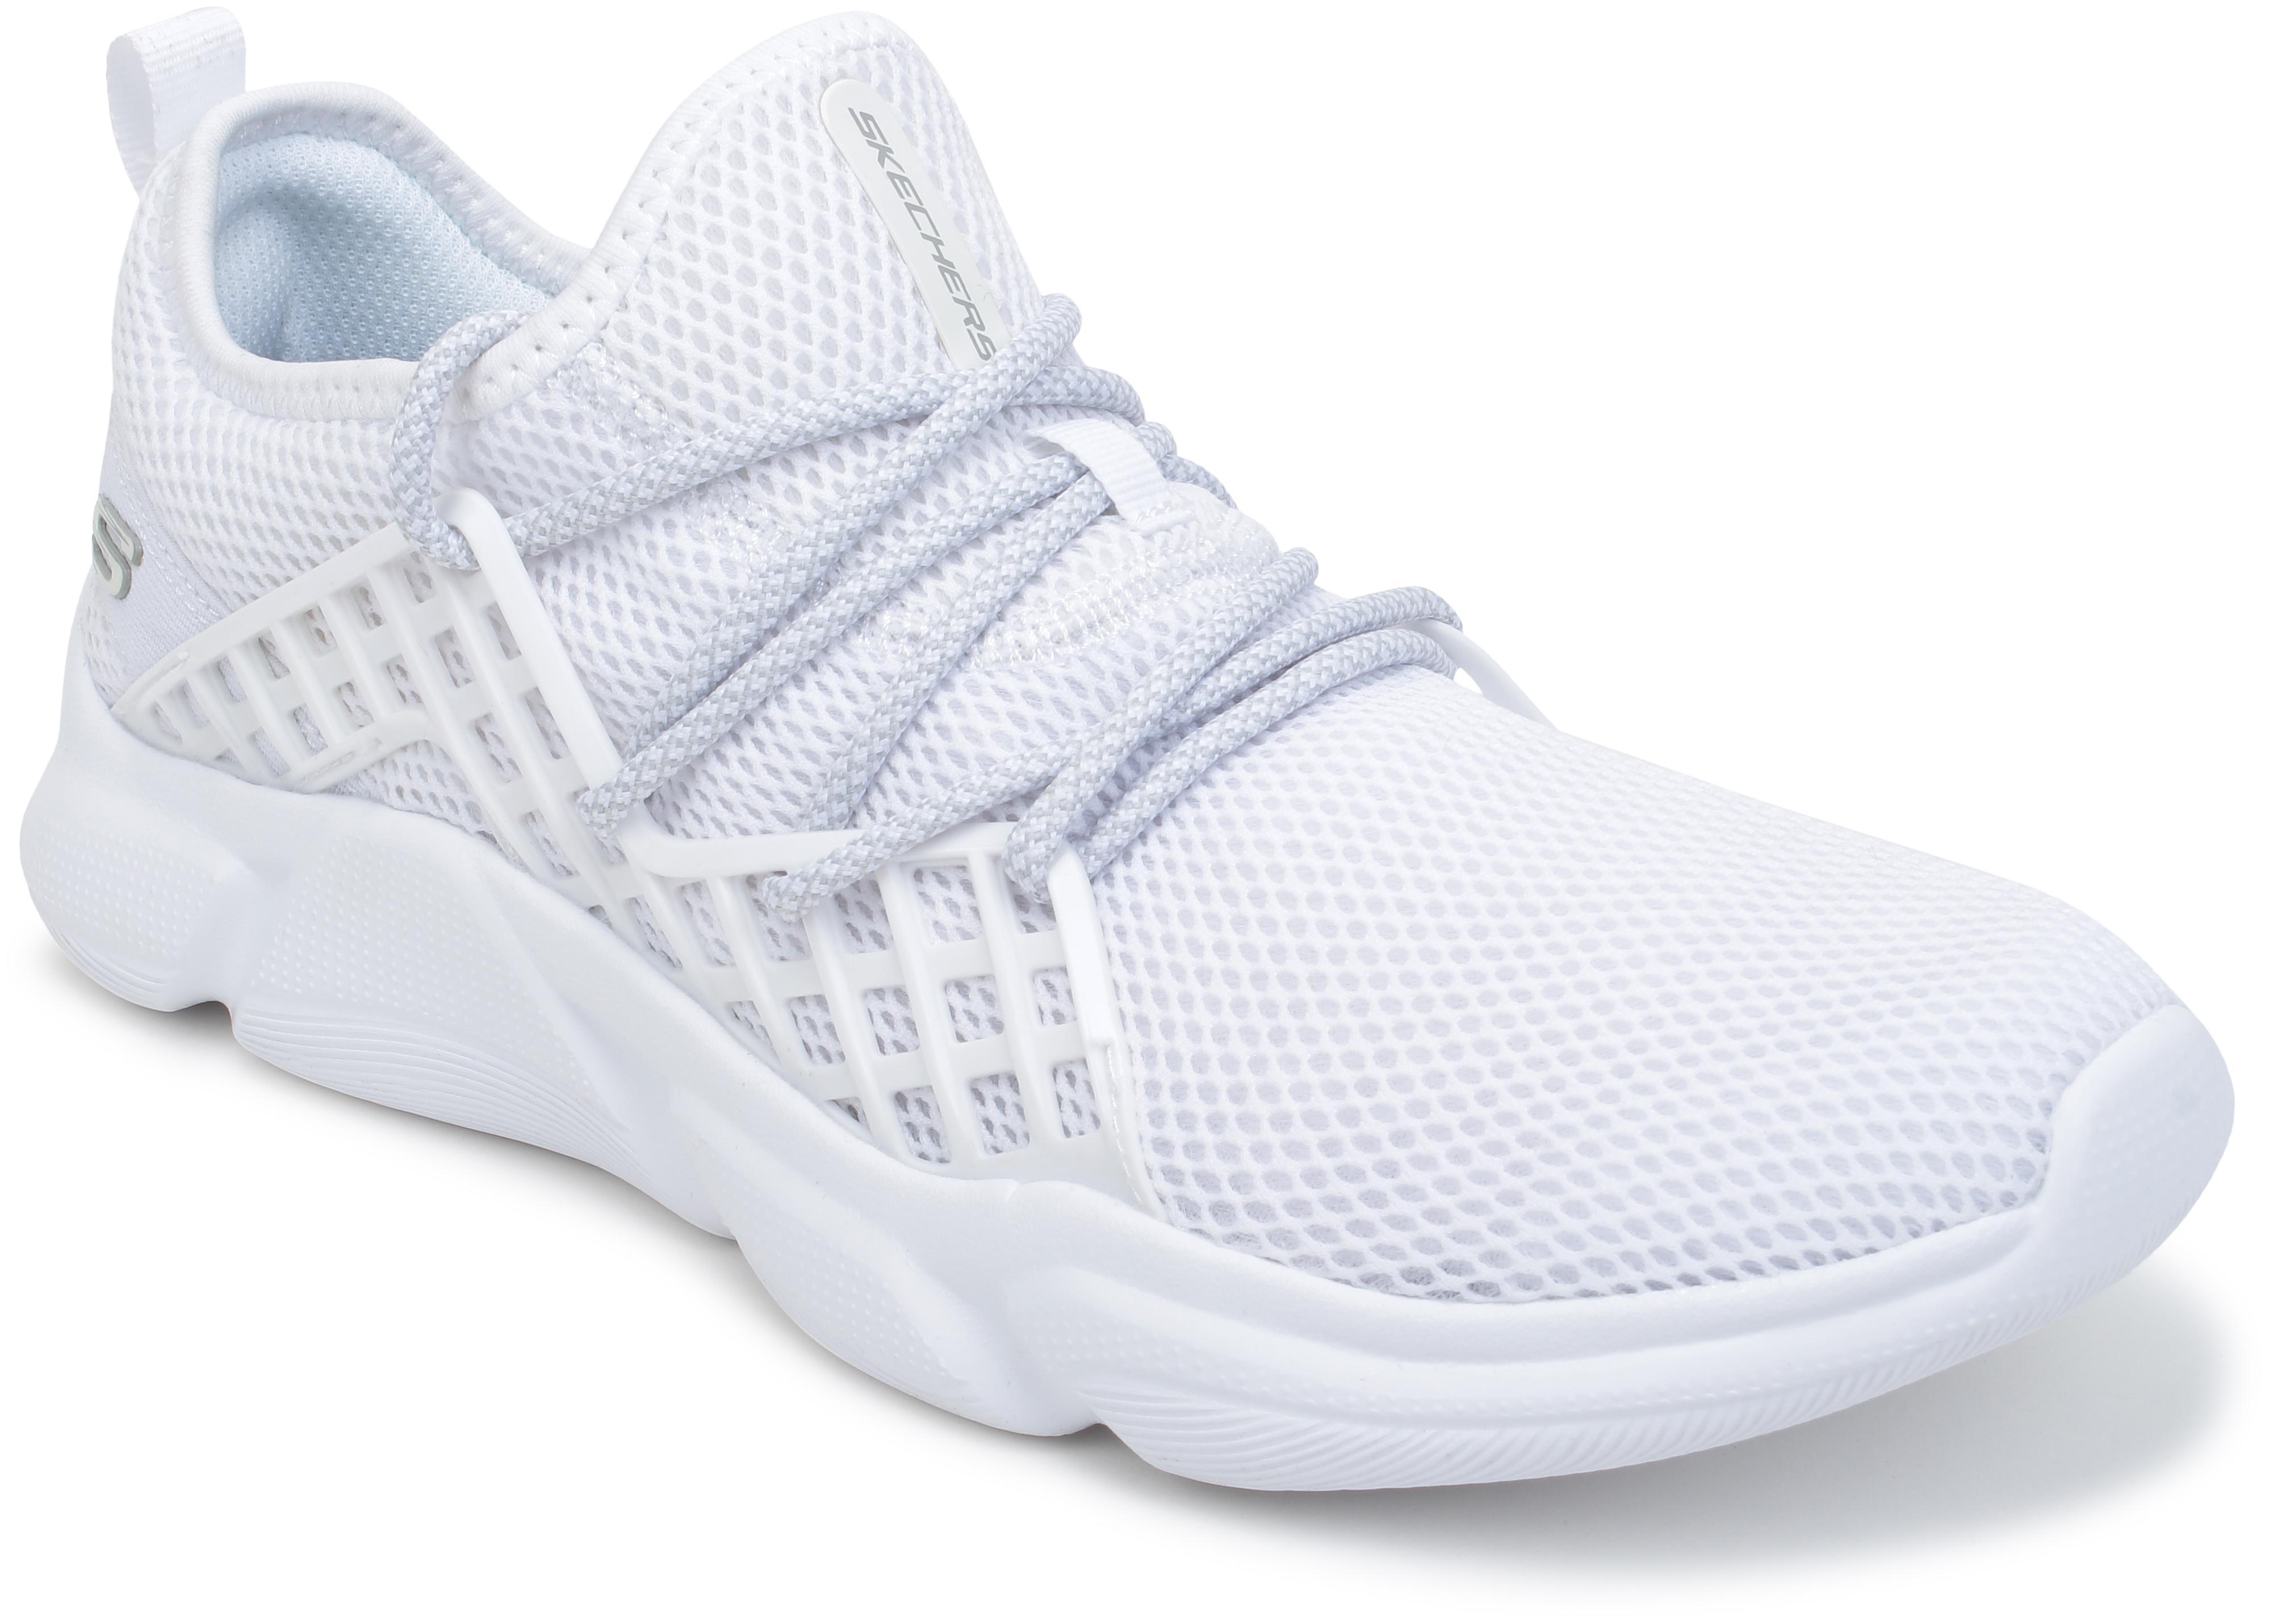 4dabb79133af Skechers Liv White Running Shoes for Men online in India at Best ...